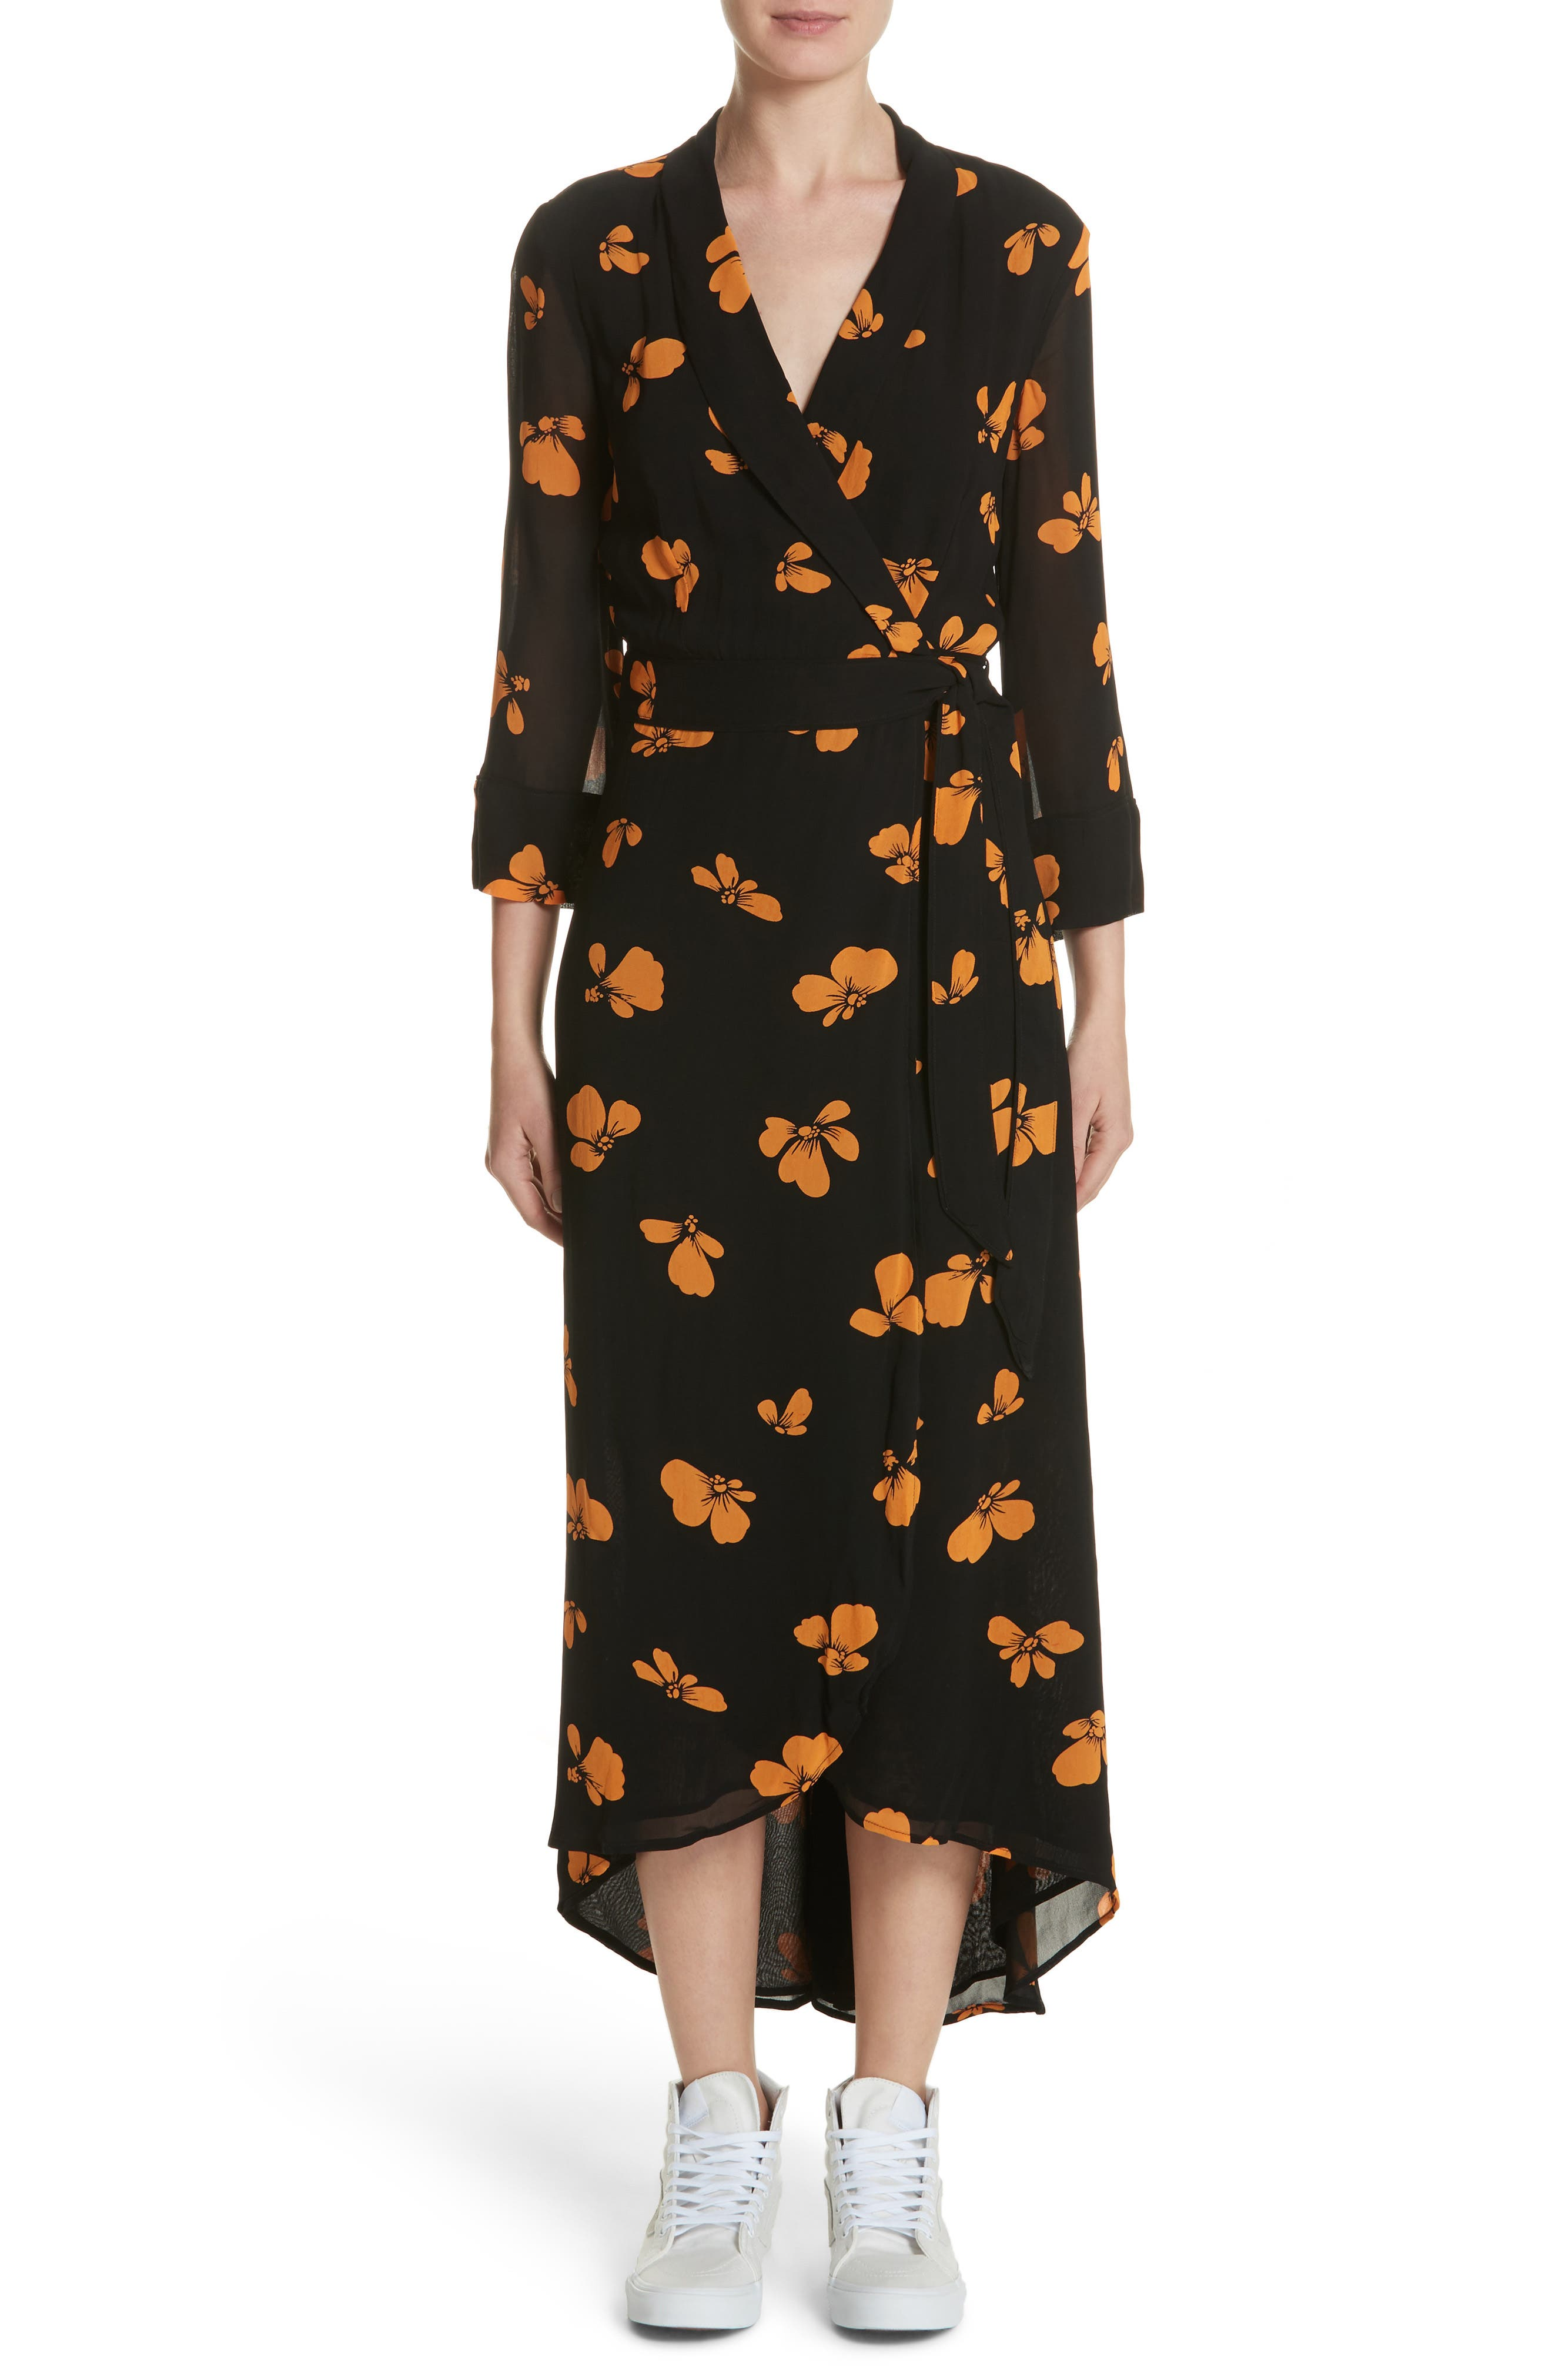 Fairfax Georgette Wrap Dress,                             Main thumbnail 1, color,                             Black